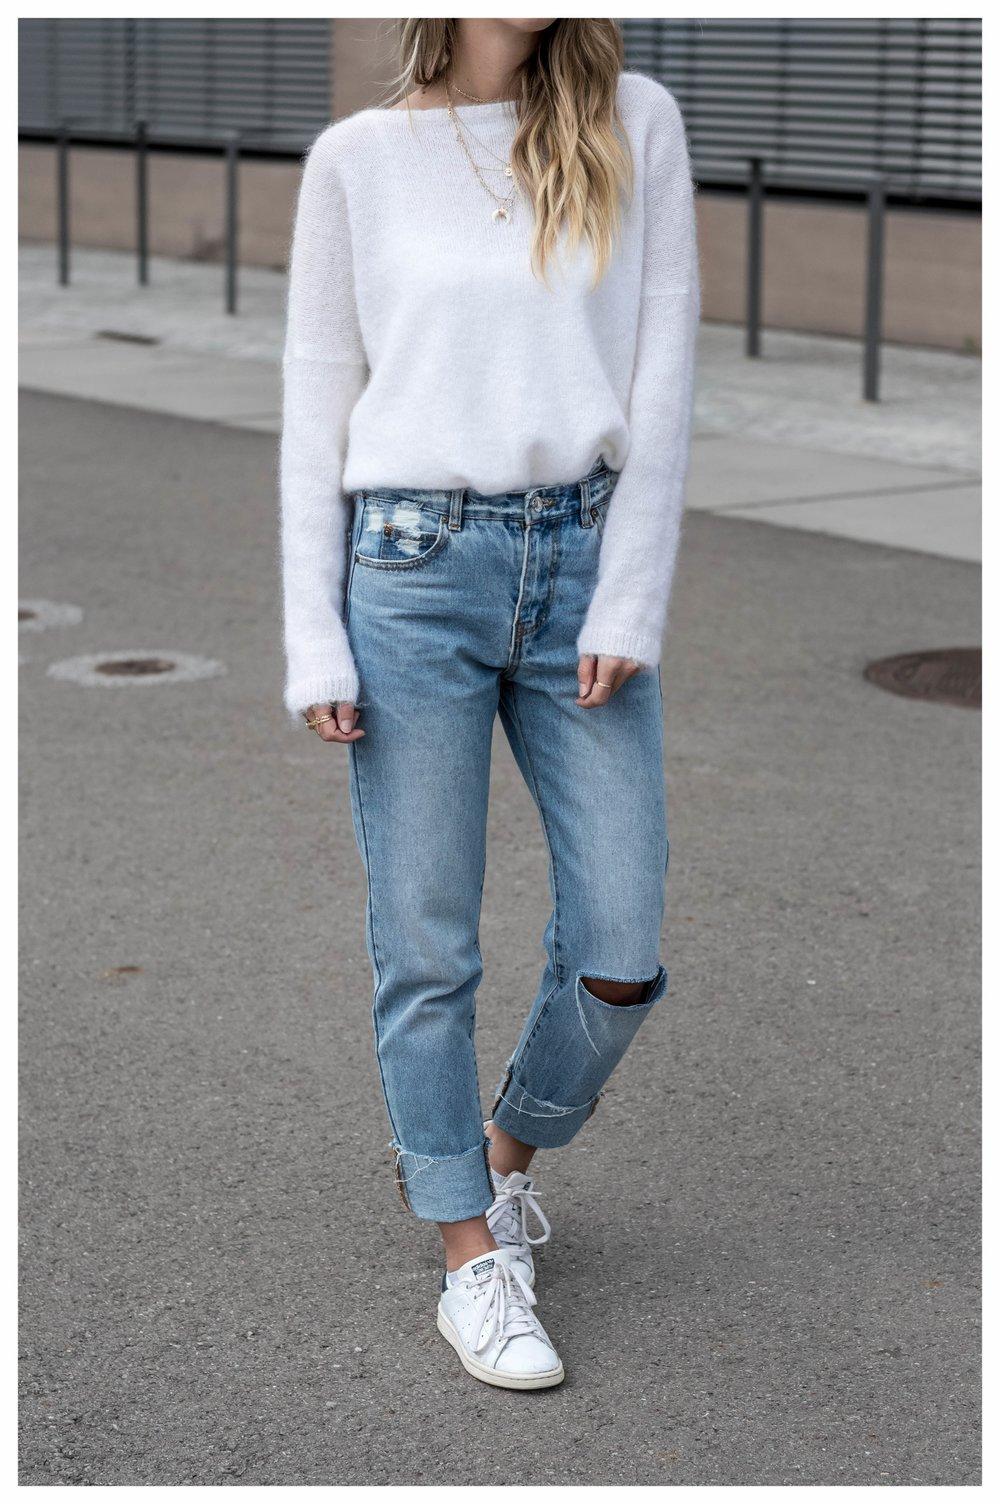 High Jeans - OSIARAH.COM (2 sur 21).jpg